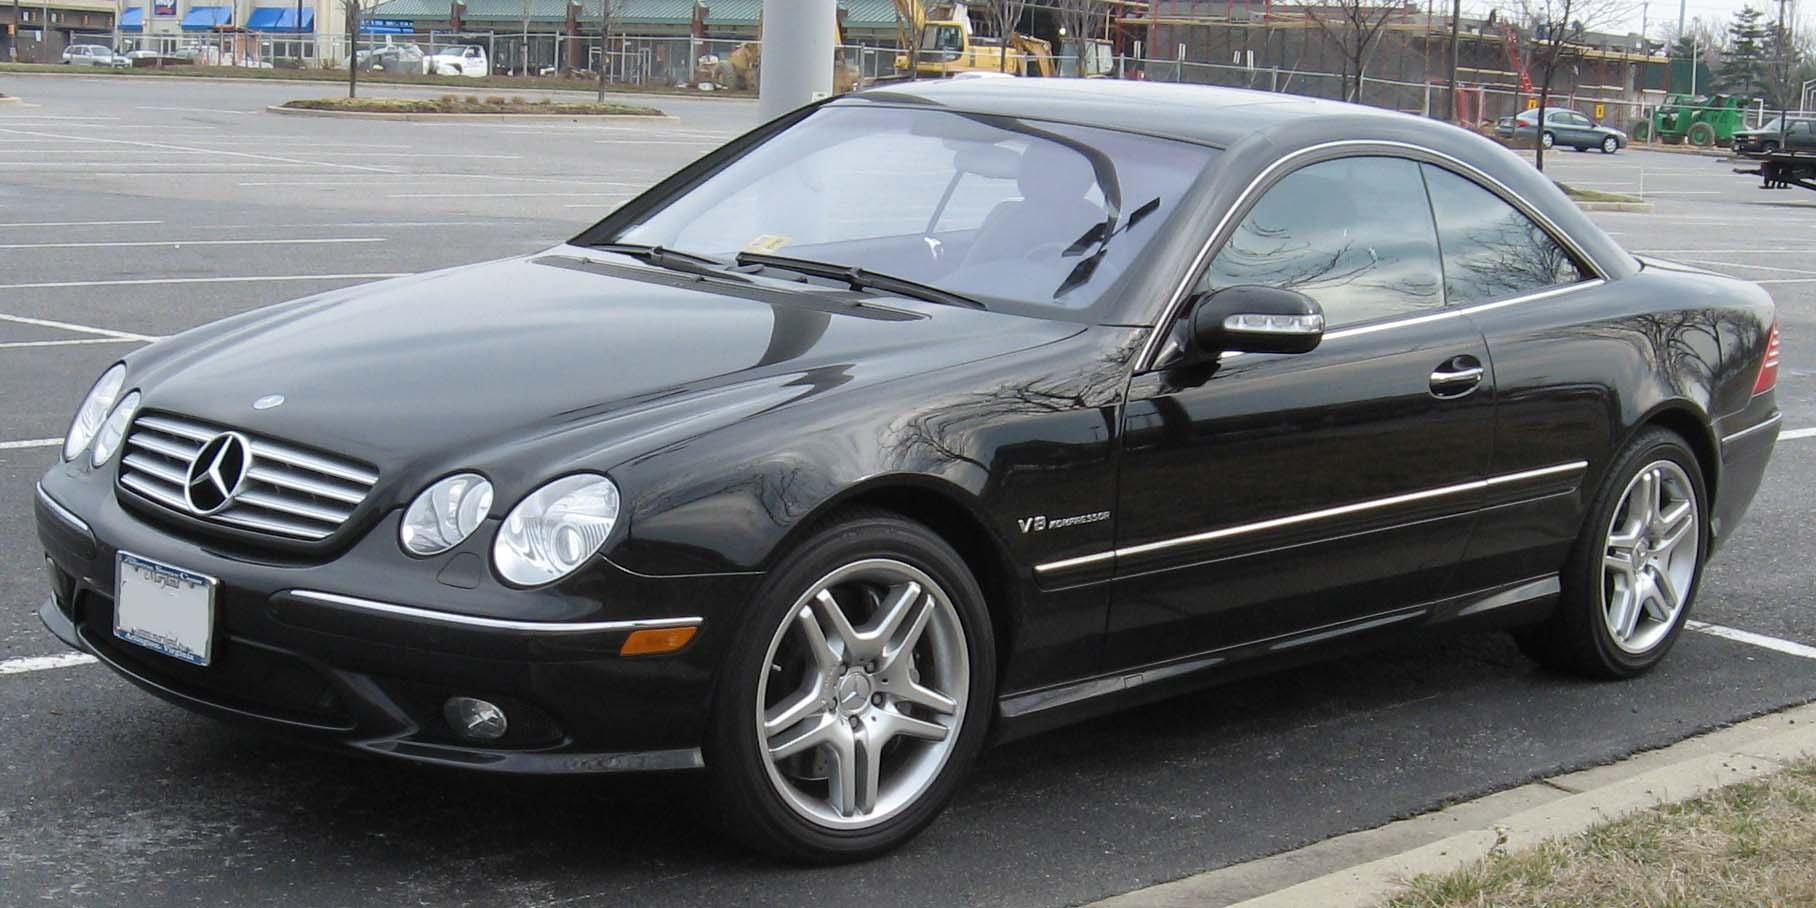 Mercedes-Benz CL-klasse AMG I (C215) 2000 - 2002 Coupe-Hardtop #6